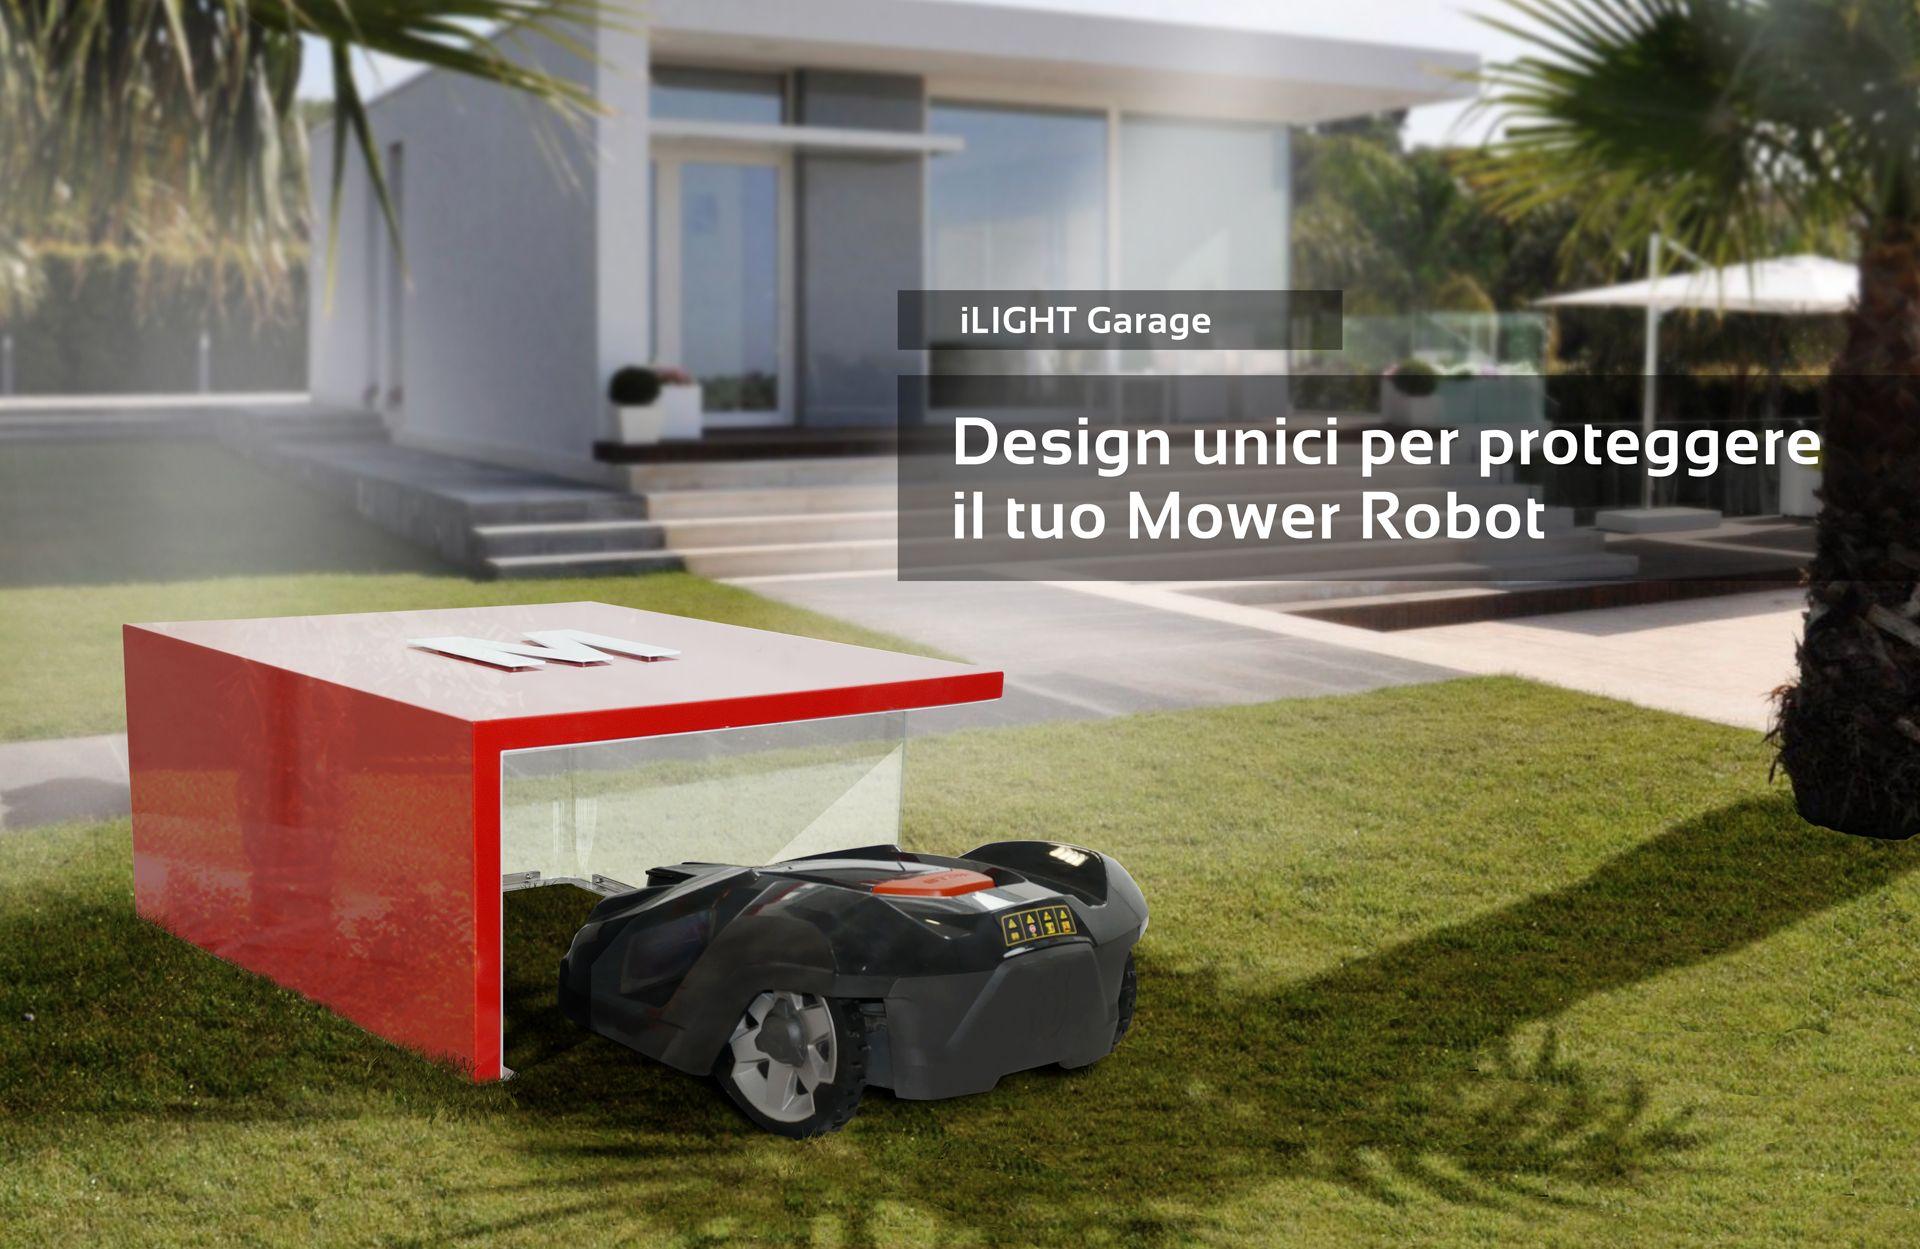 automower rasenm her roboter robotic lawn mower tondeuse robot garage design. Black Bedroom Furniture Sets. Home Design Ideas